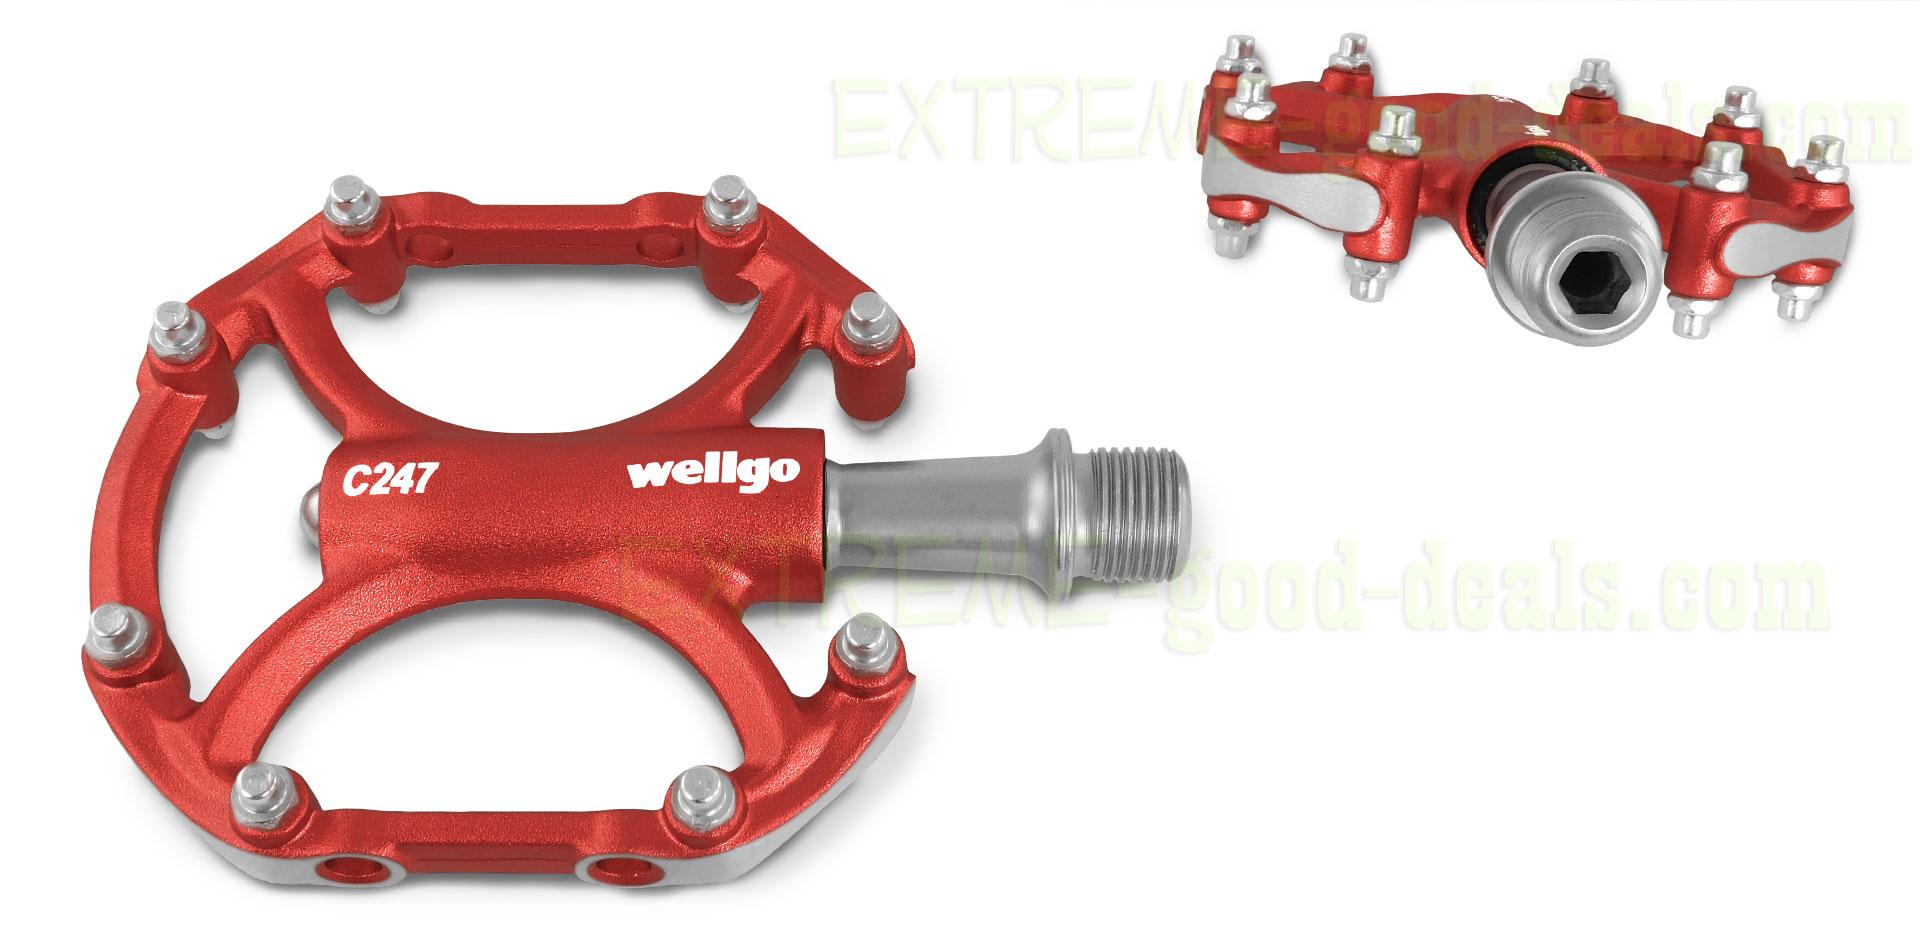 Wellgo C247 Aluminum Alloy Platform Bike Pedals Anodized